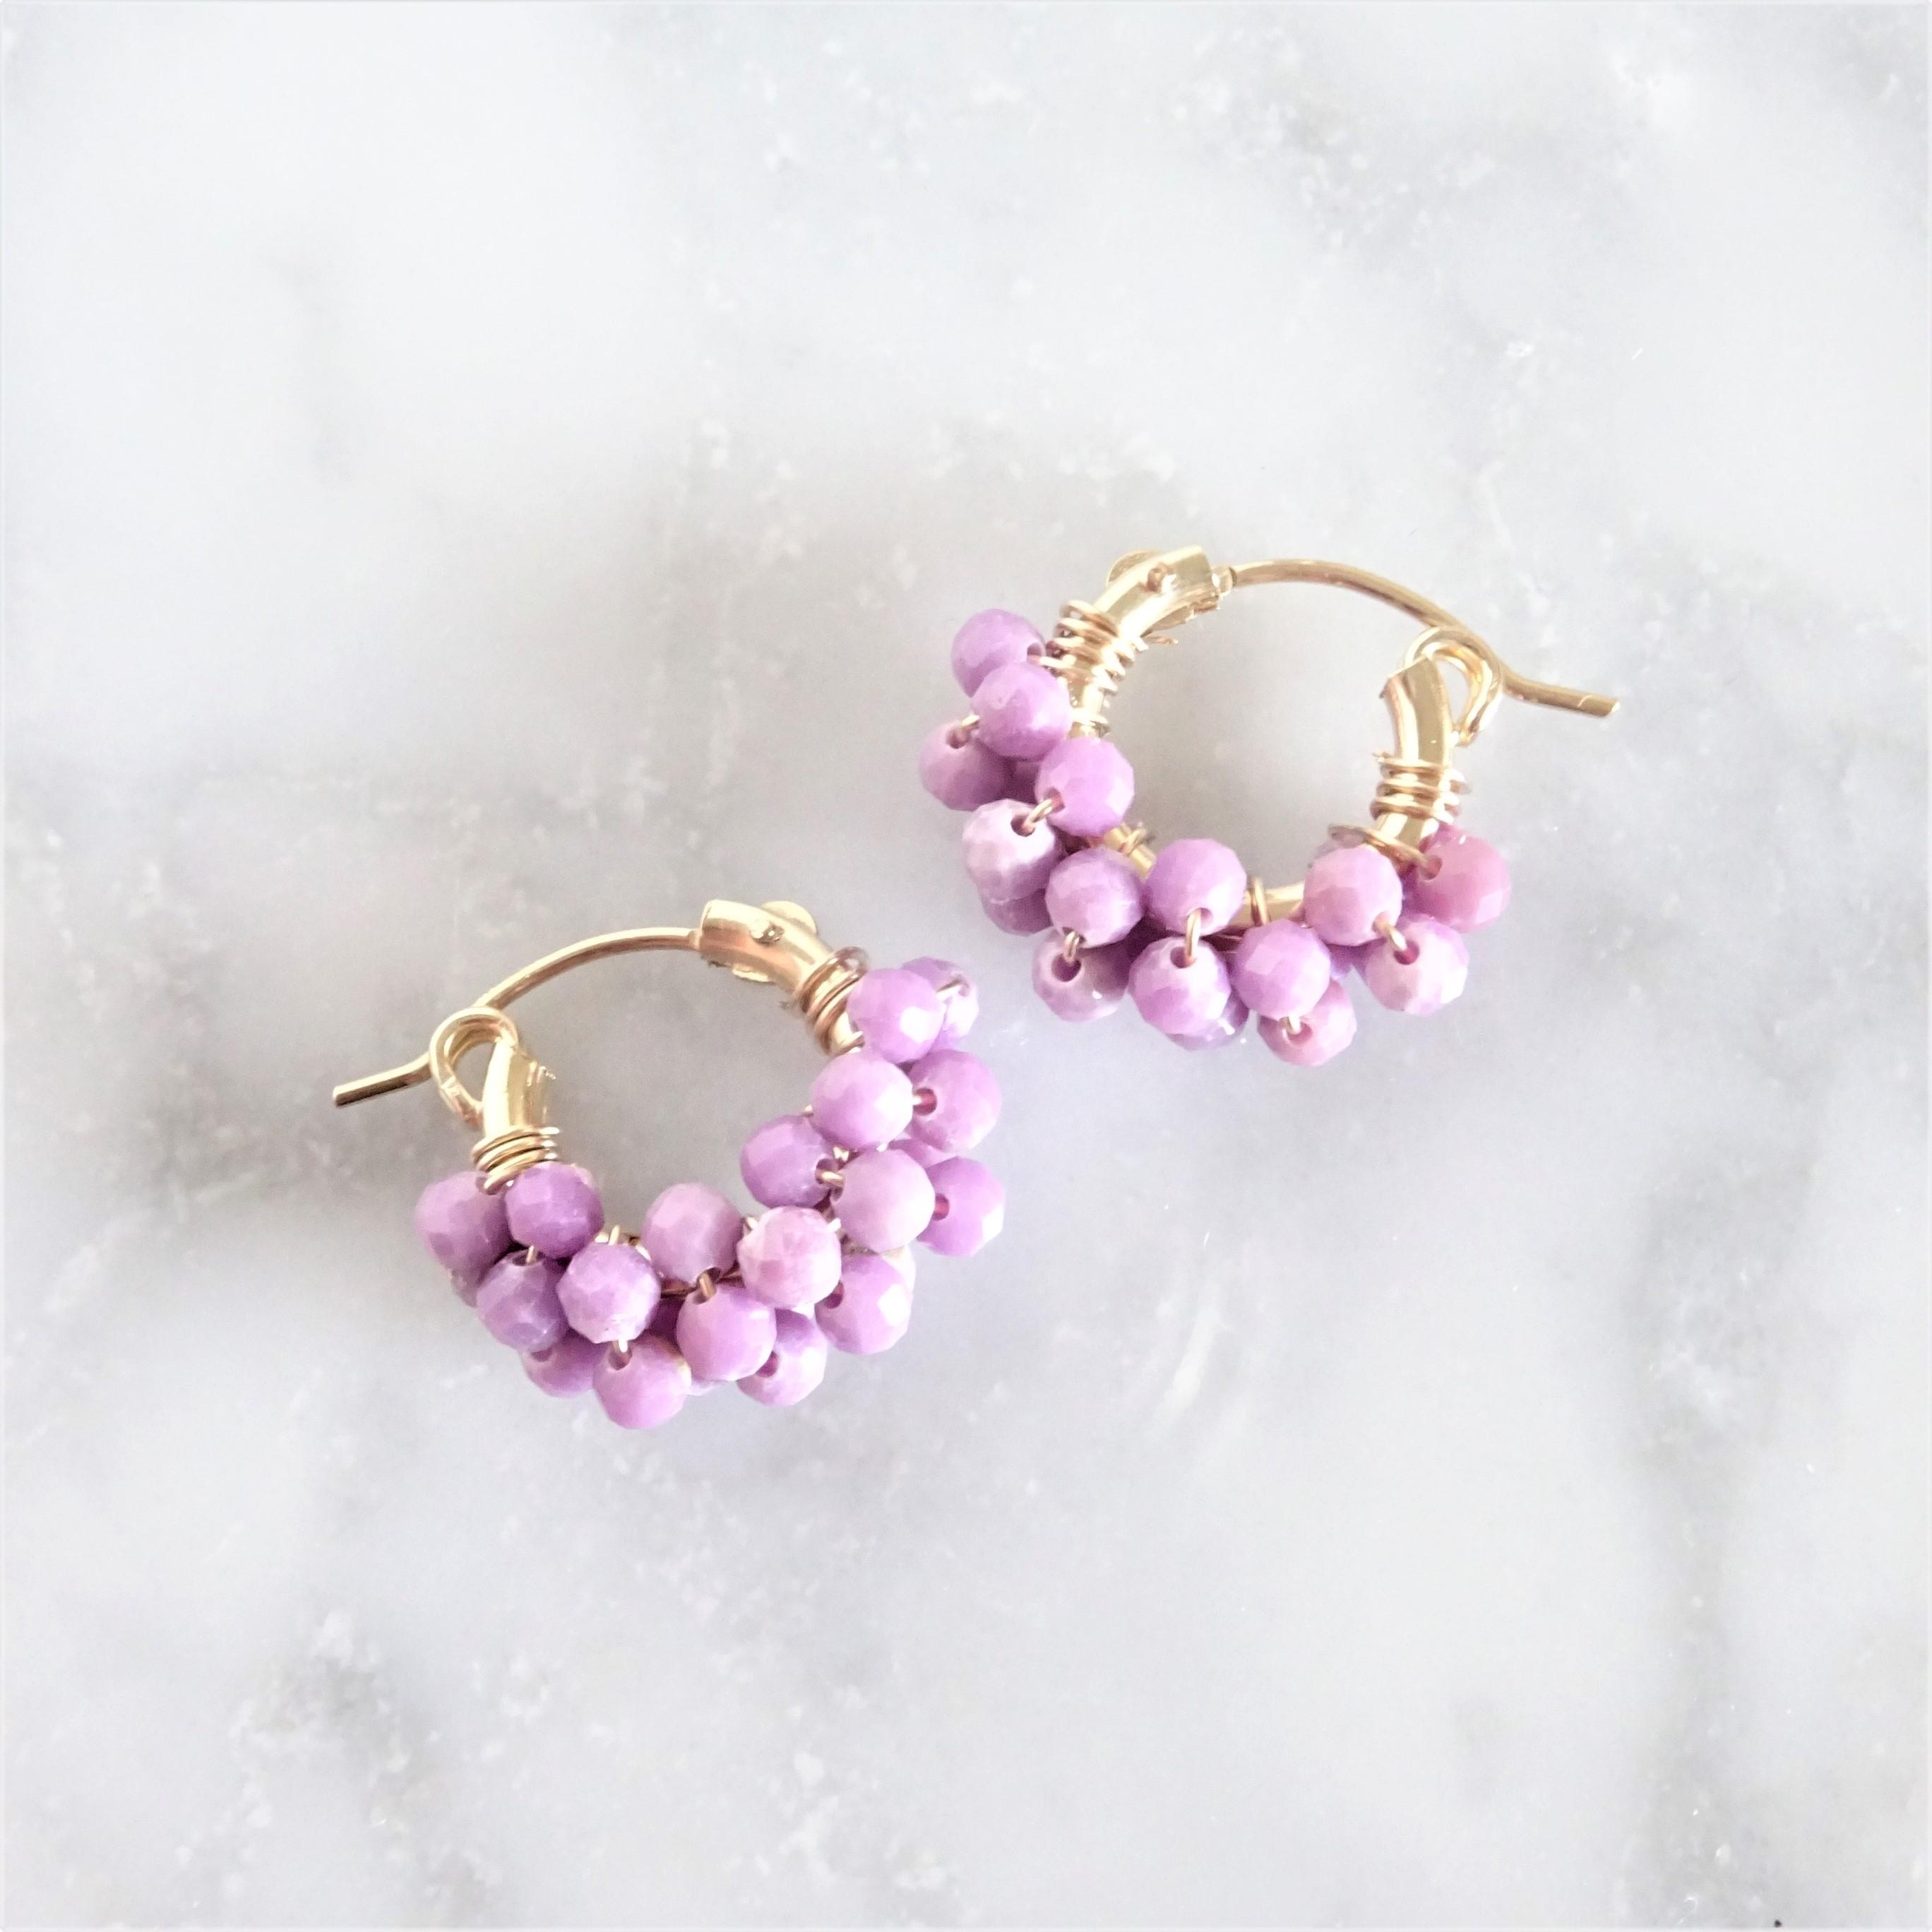 14kgf*Phosphosiderite pavé pierced earring / earring